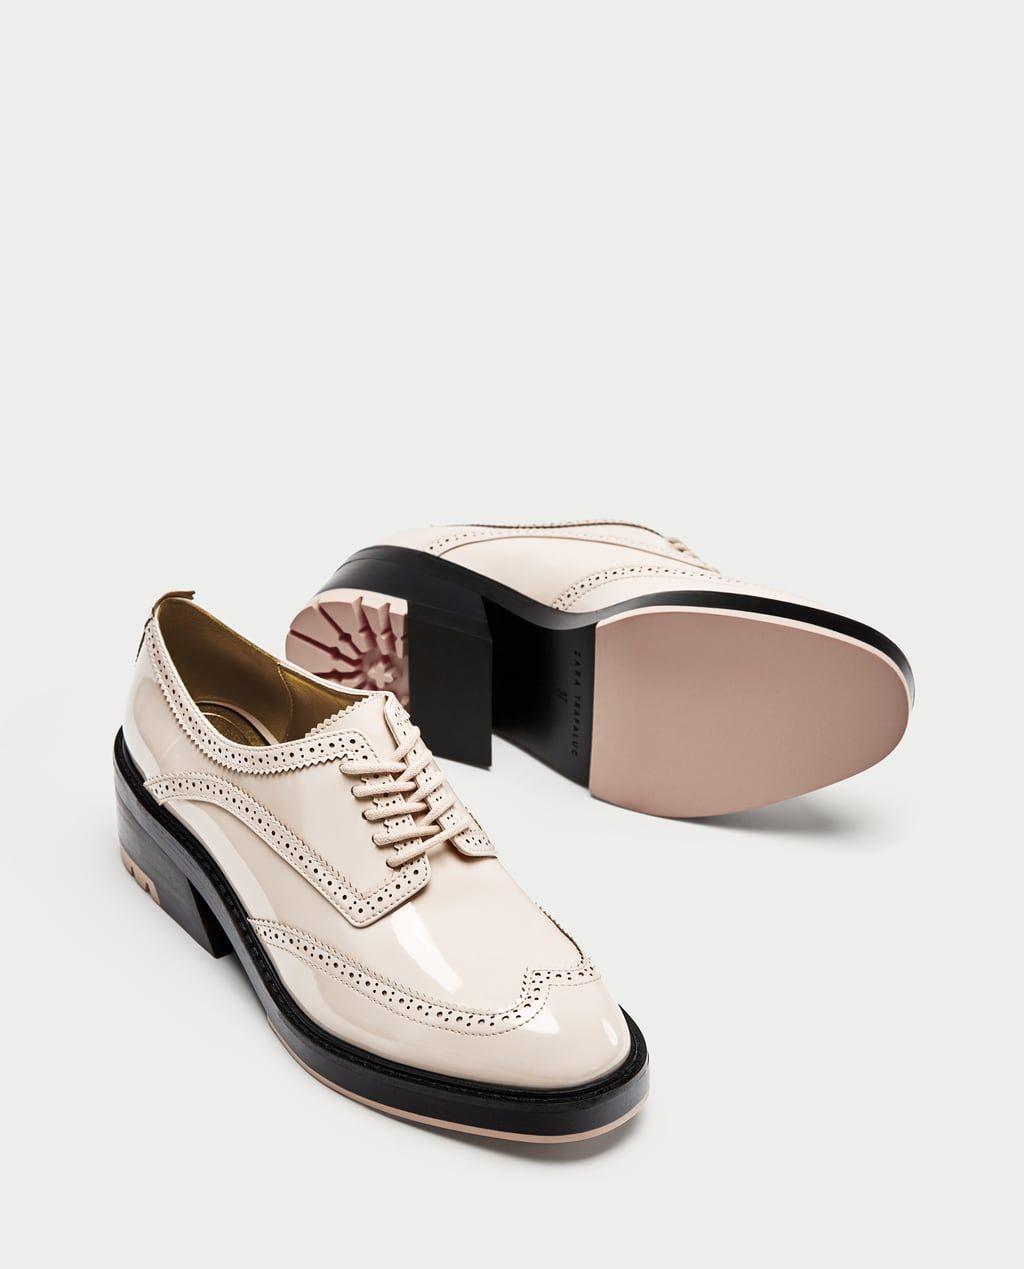 872b28bc031 BLUCHER CHAROL PICADOS-Zapatos planos-ZAPATOS-MUJER